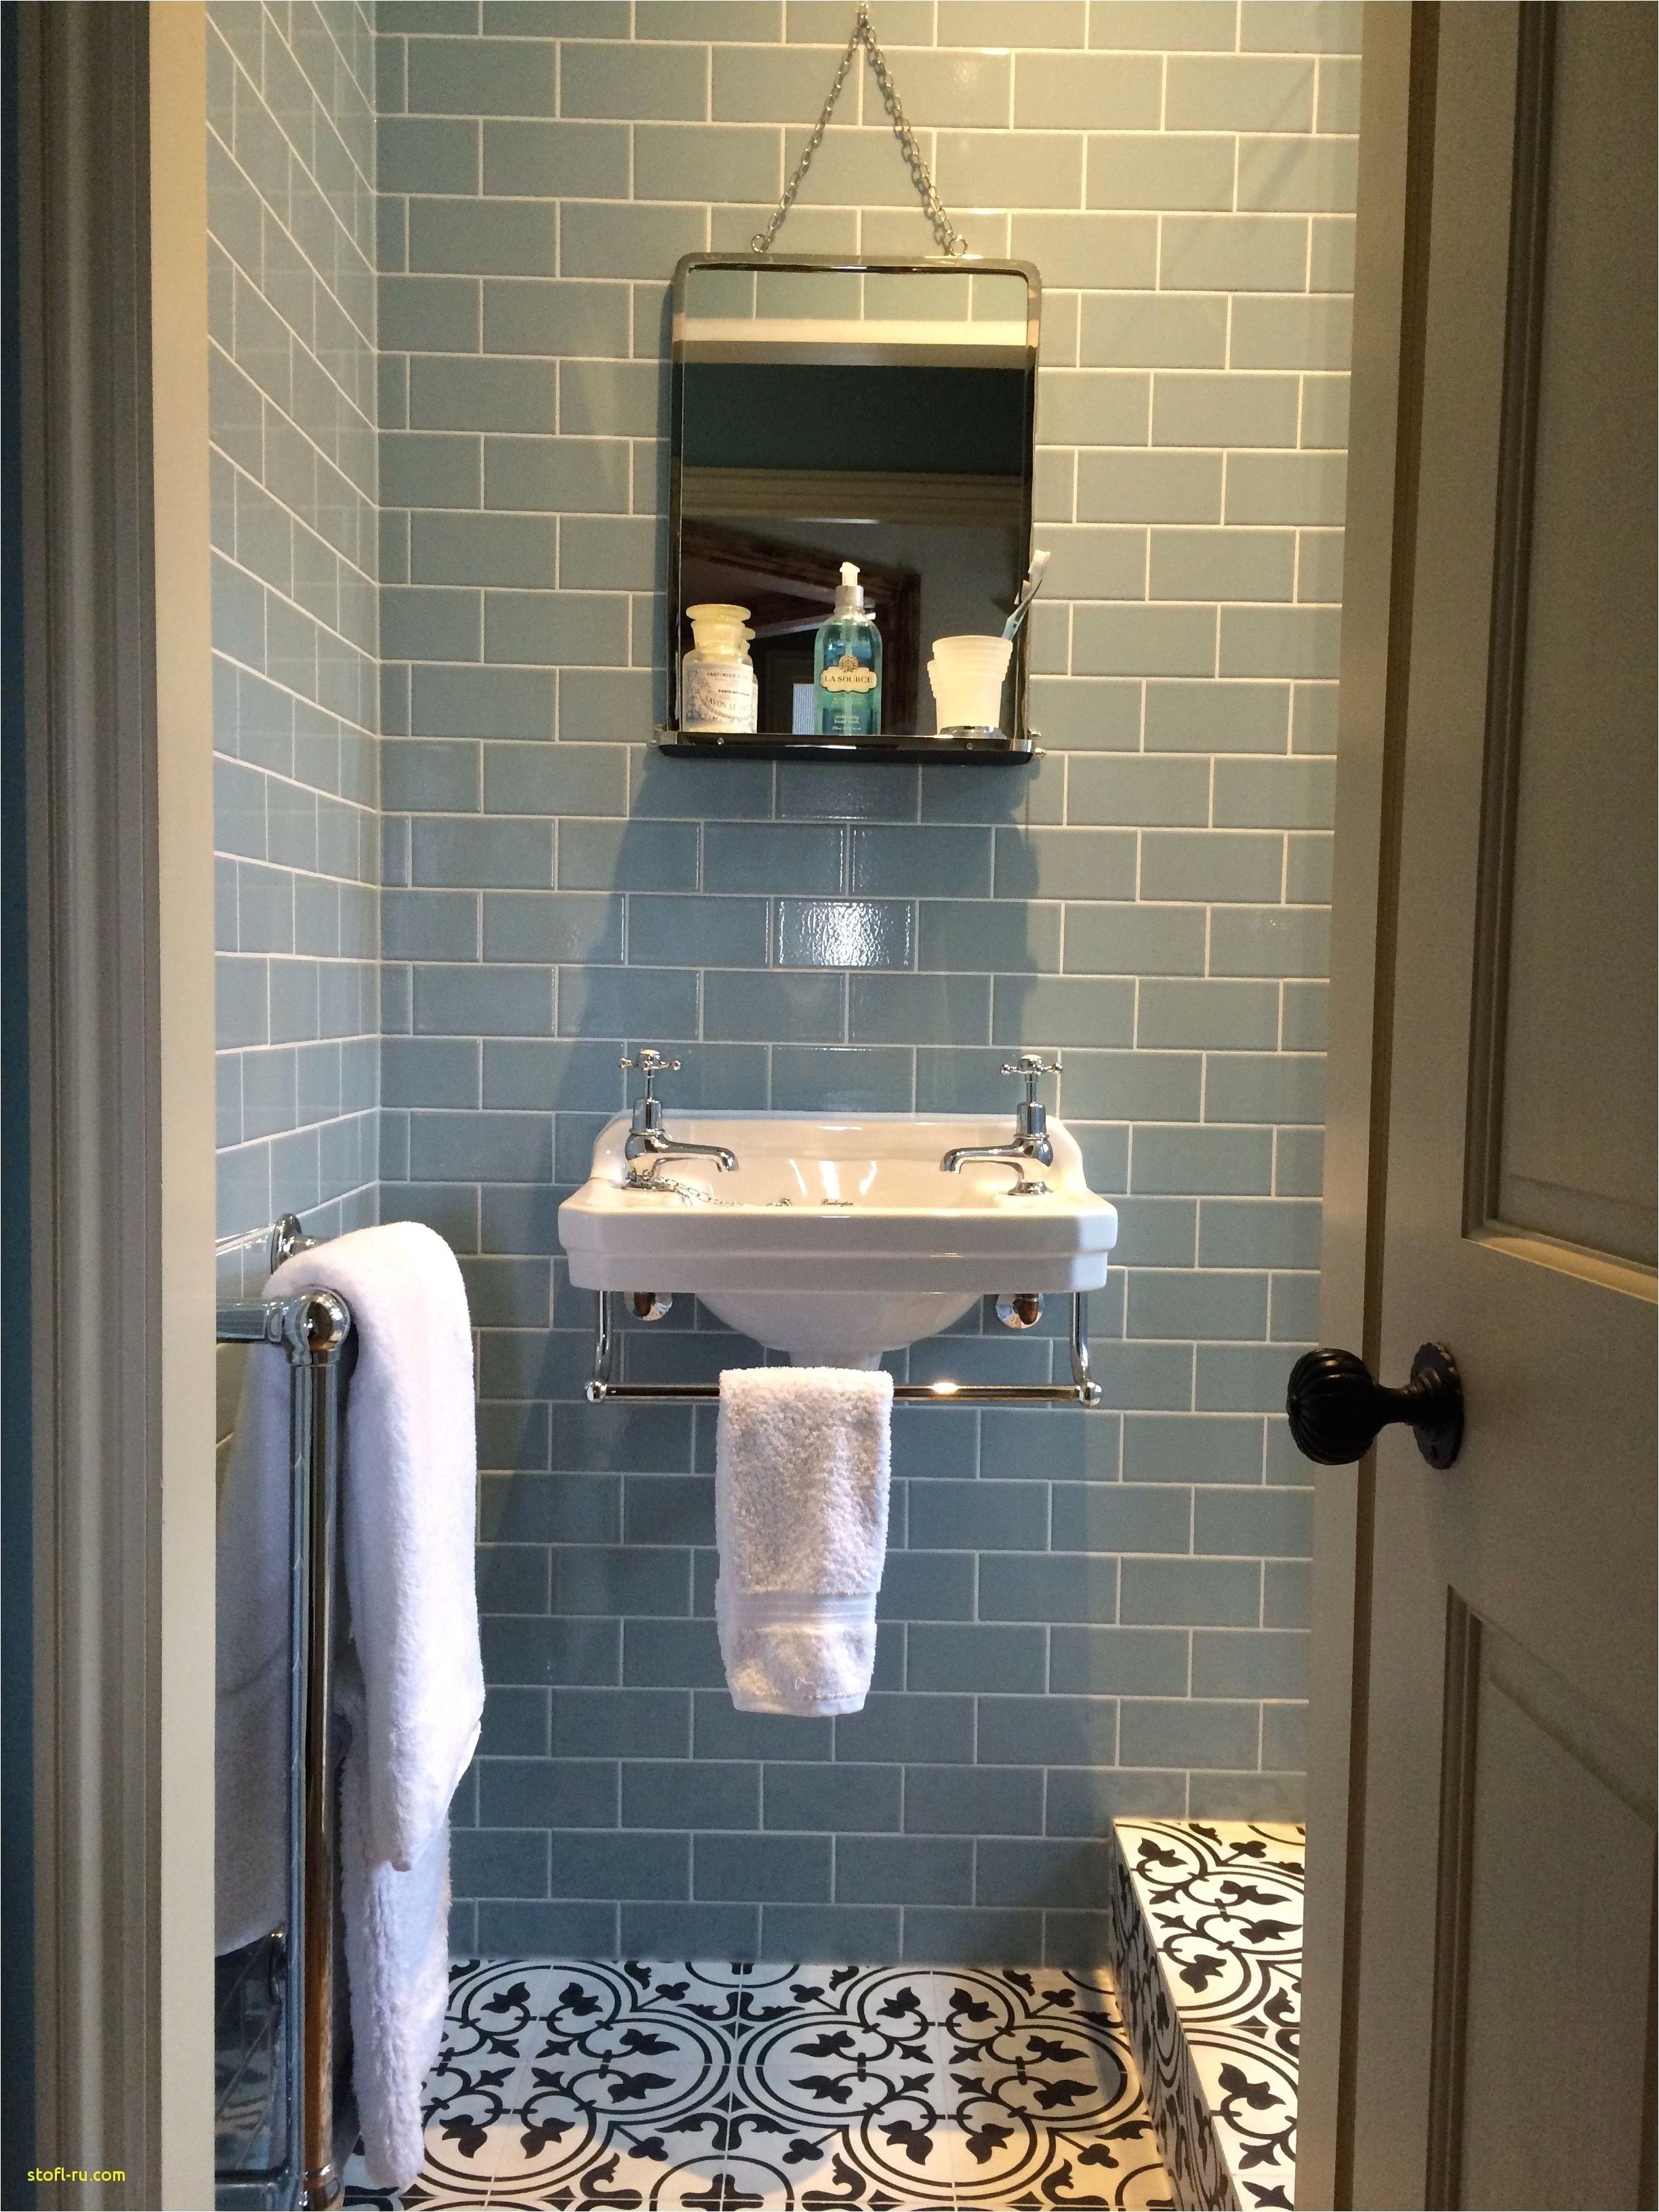 0d Ideas Contemporary Bathroom Design New Bathroom Designs Ideas Home Modern Style House Design Ideas